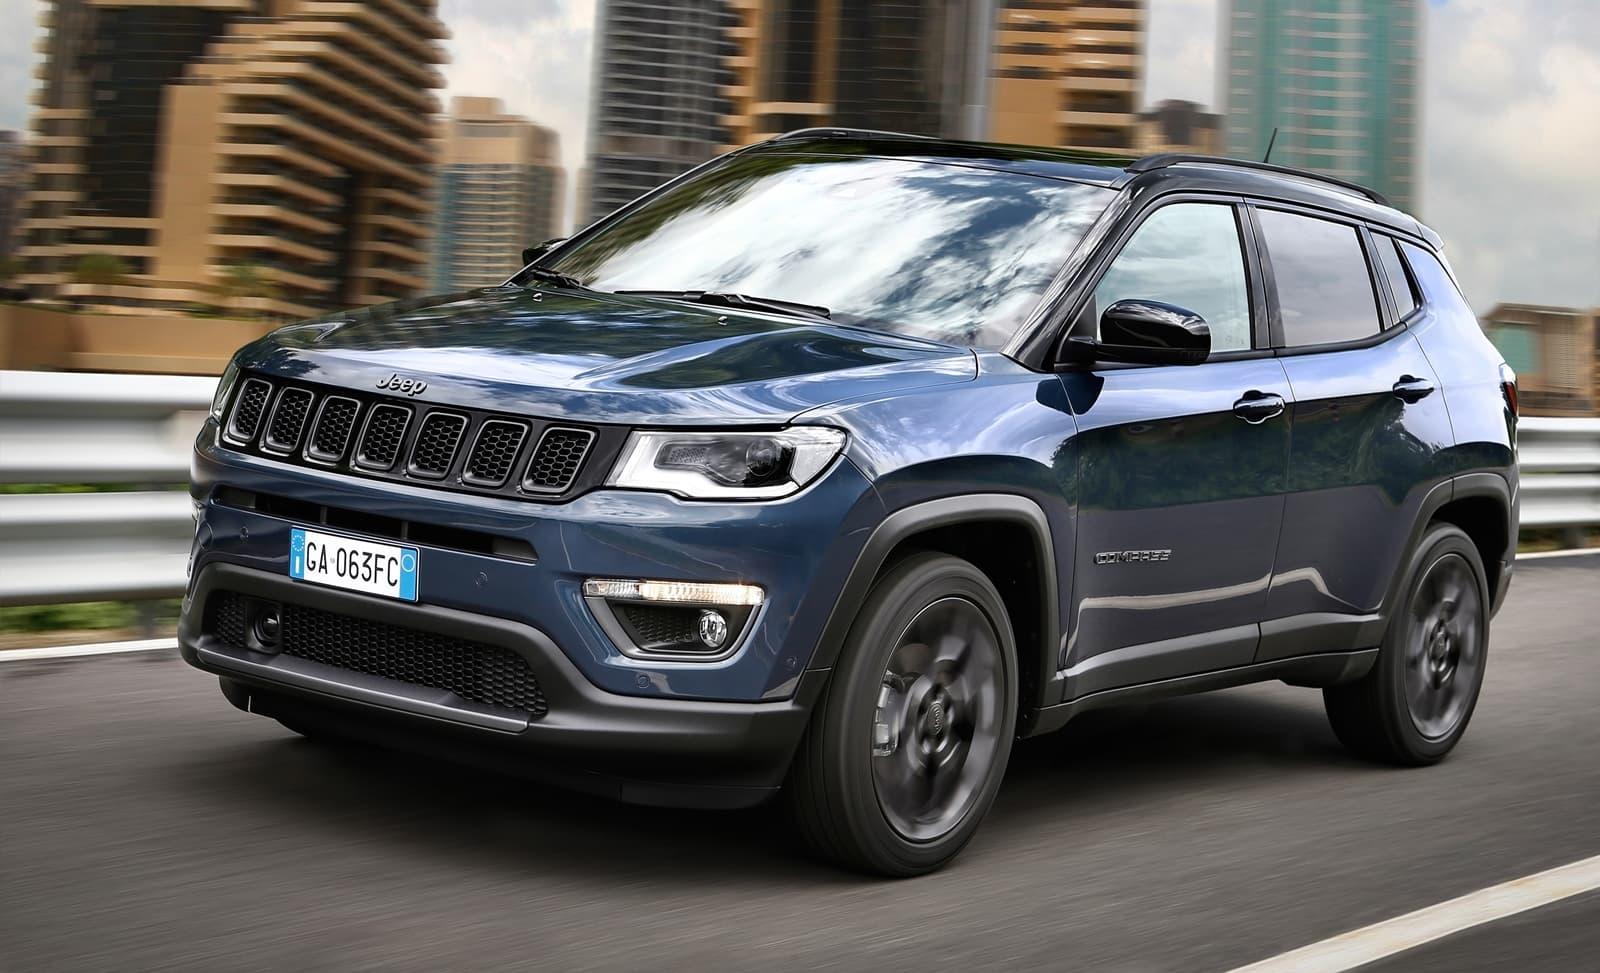 2021 Jeep Compass Performance